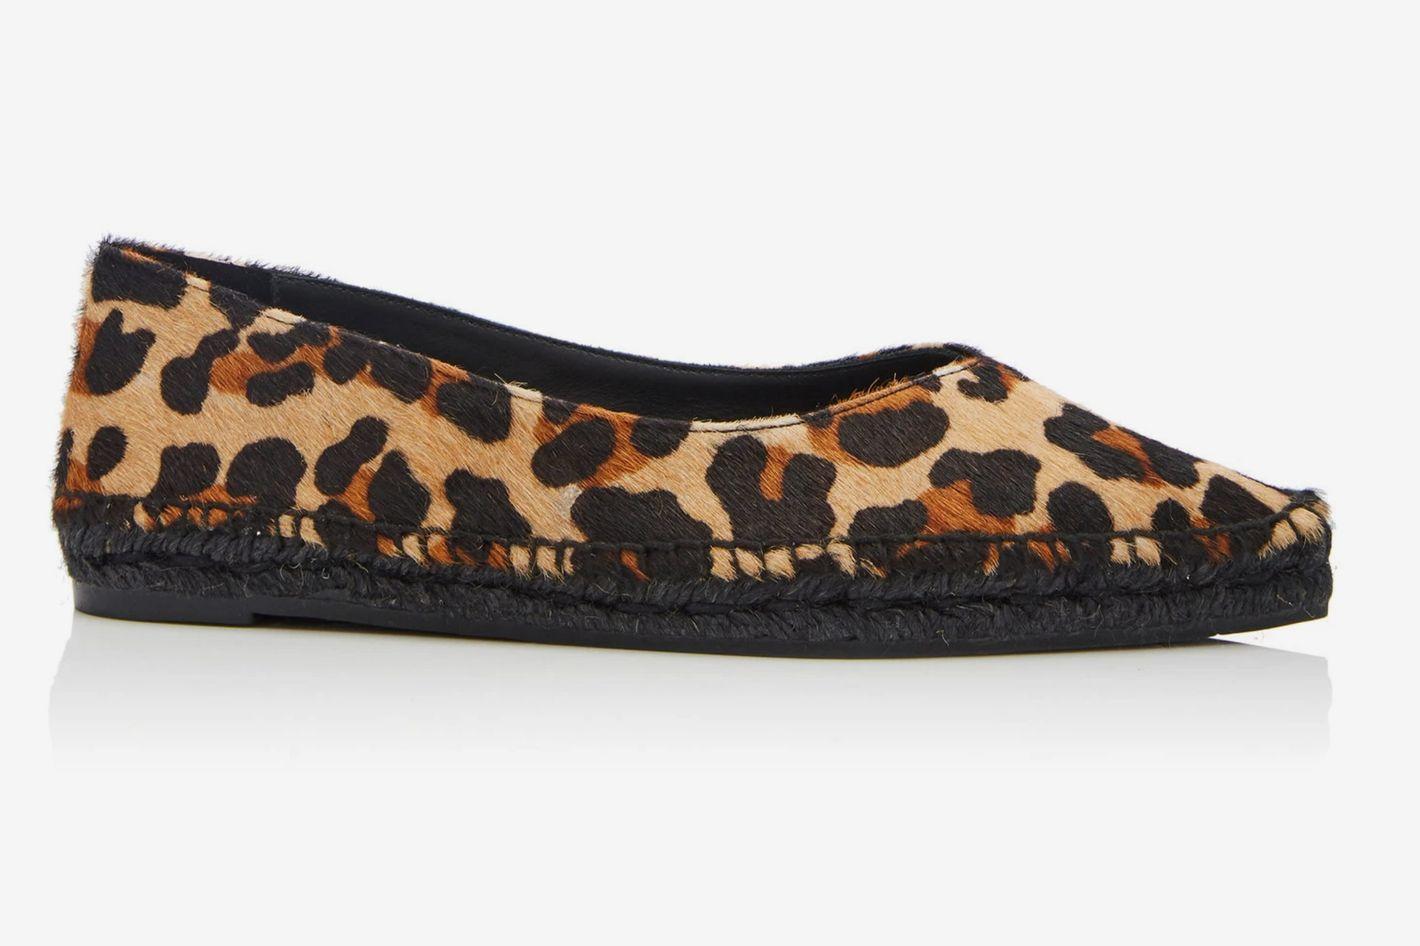 Castañer Rosme Leopard-Print Calf-Hair Espadrilles